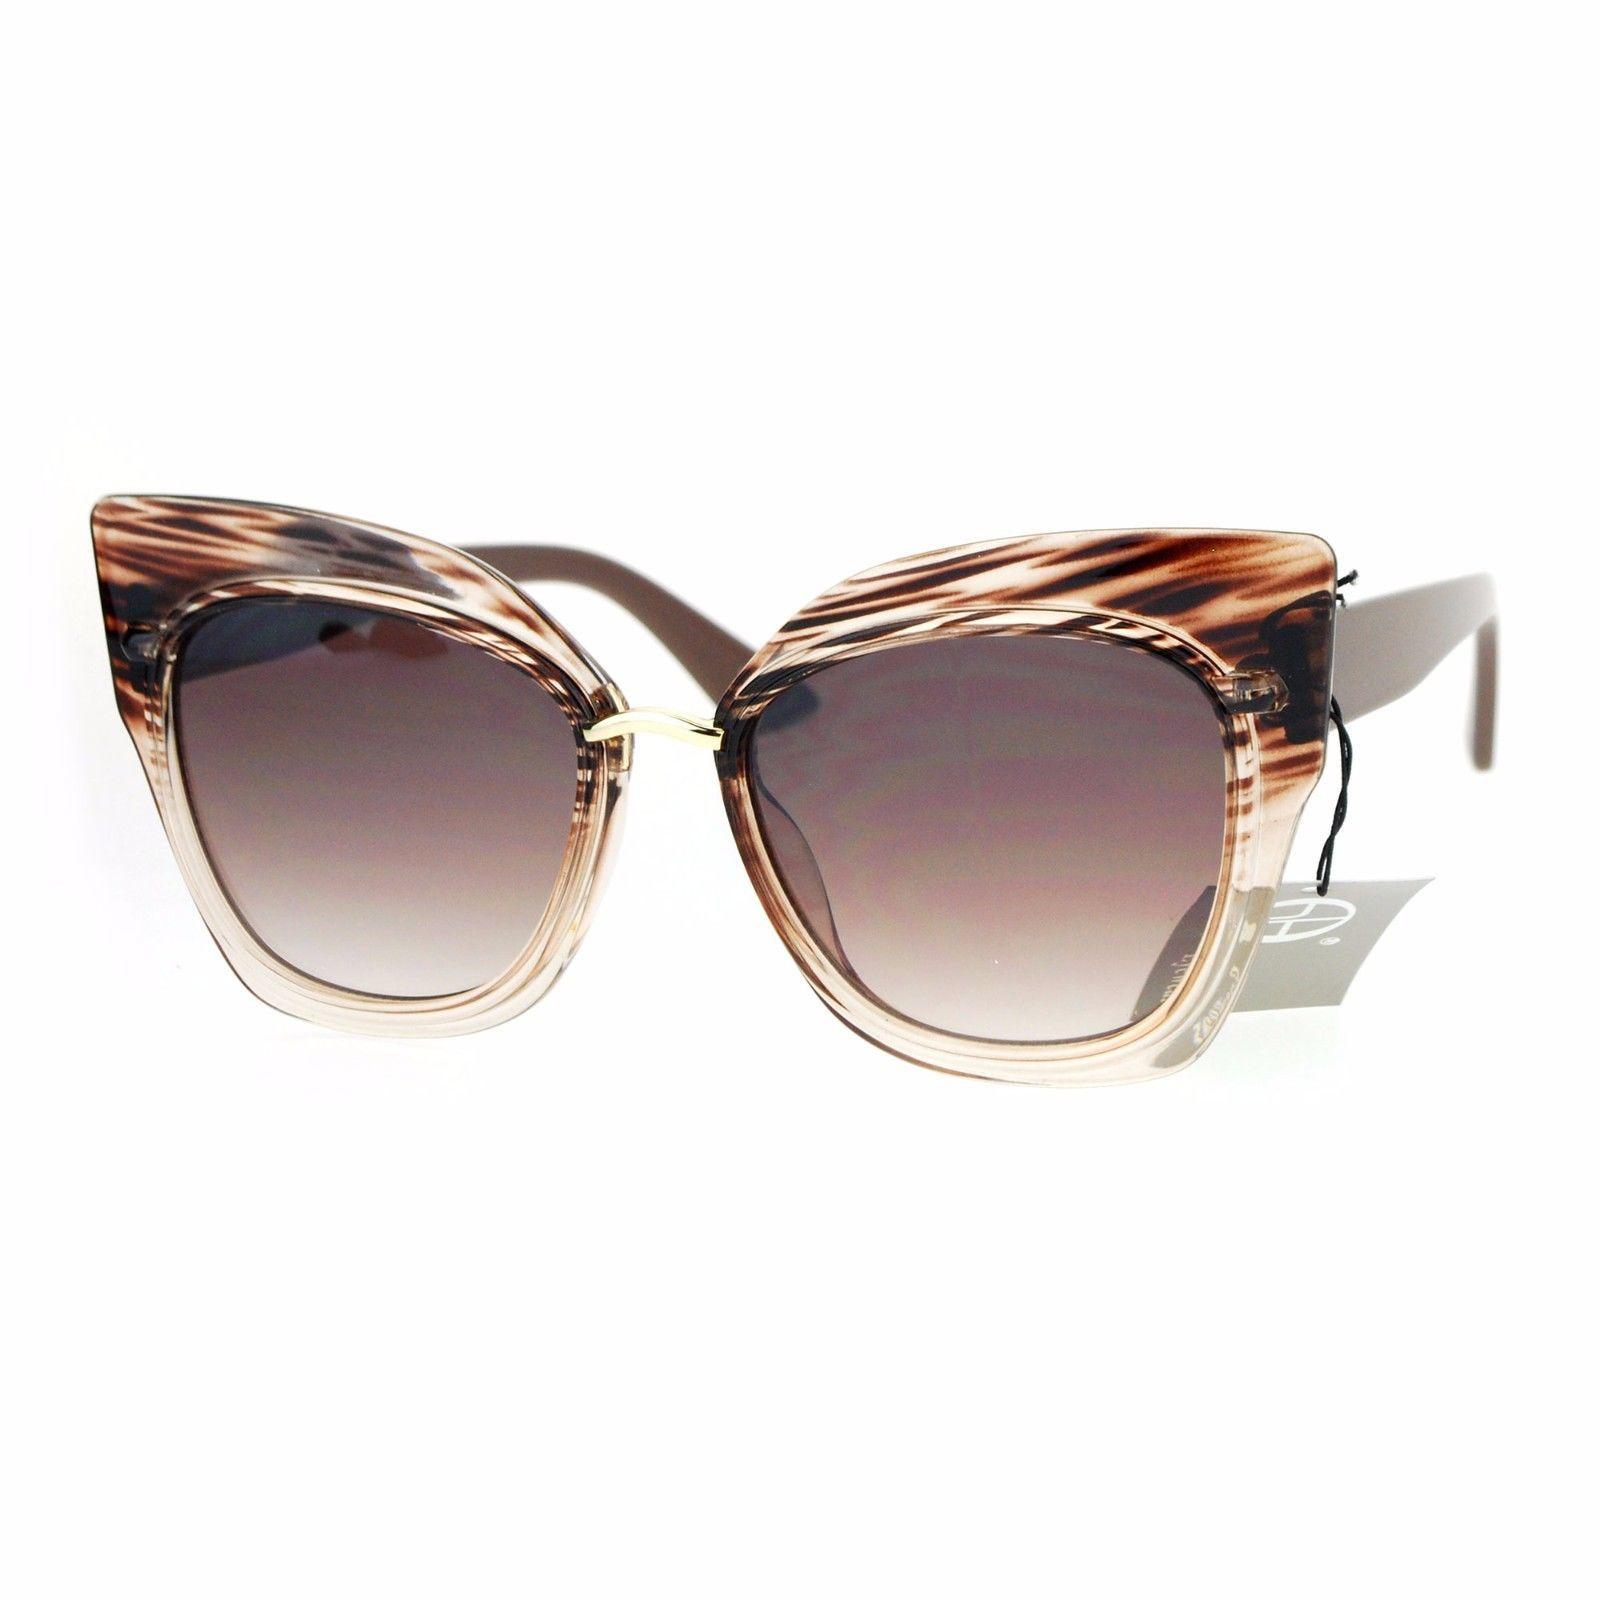 Oversized Fashion Sunglasses Womens Square Cateye Butterfly UV 400 image 13